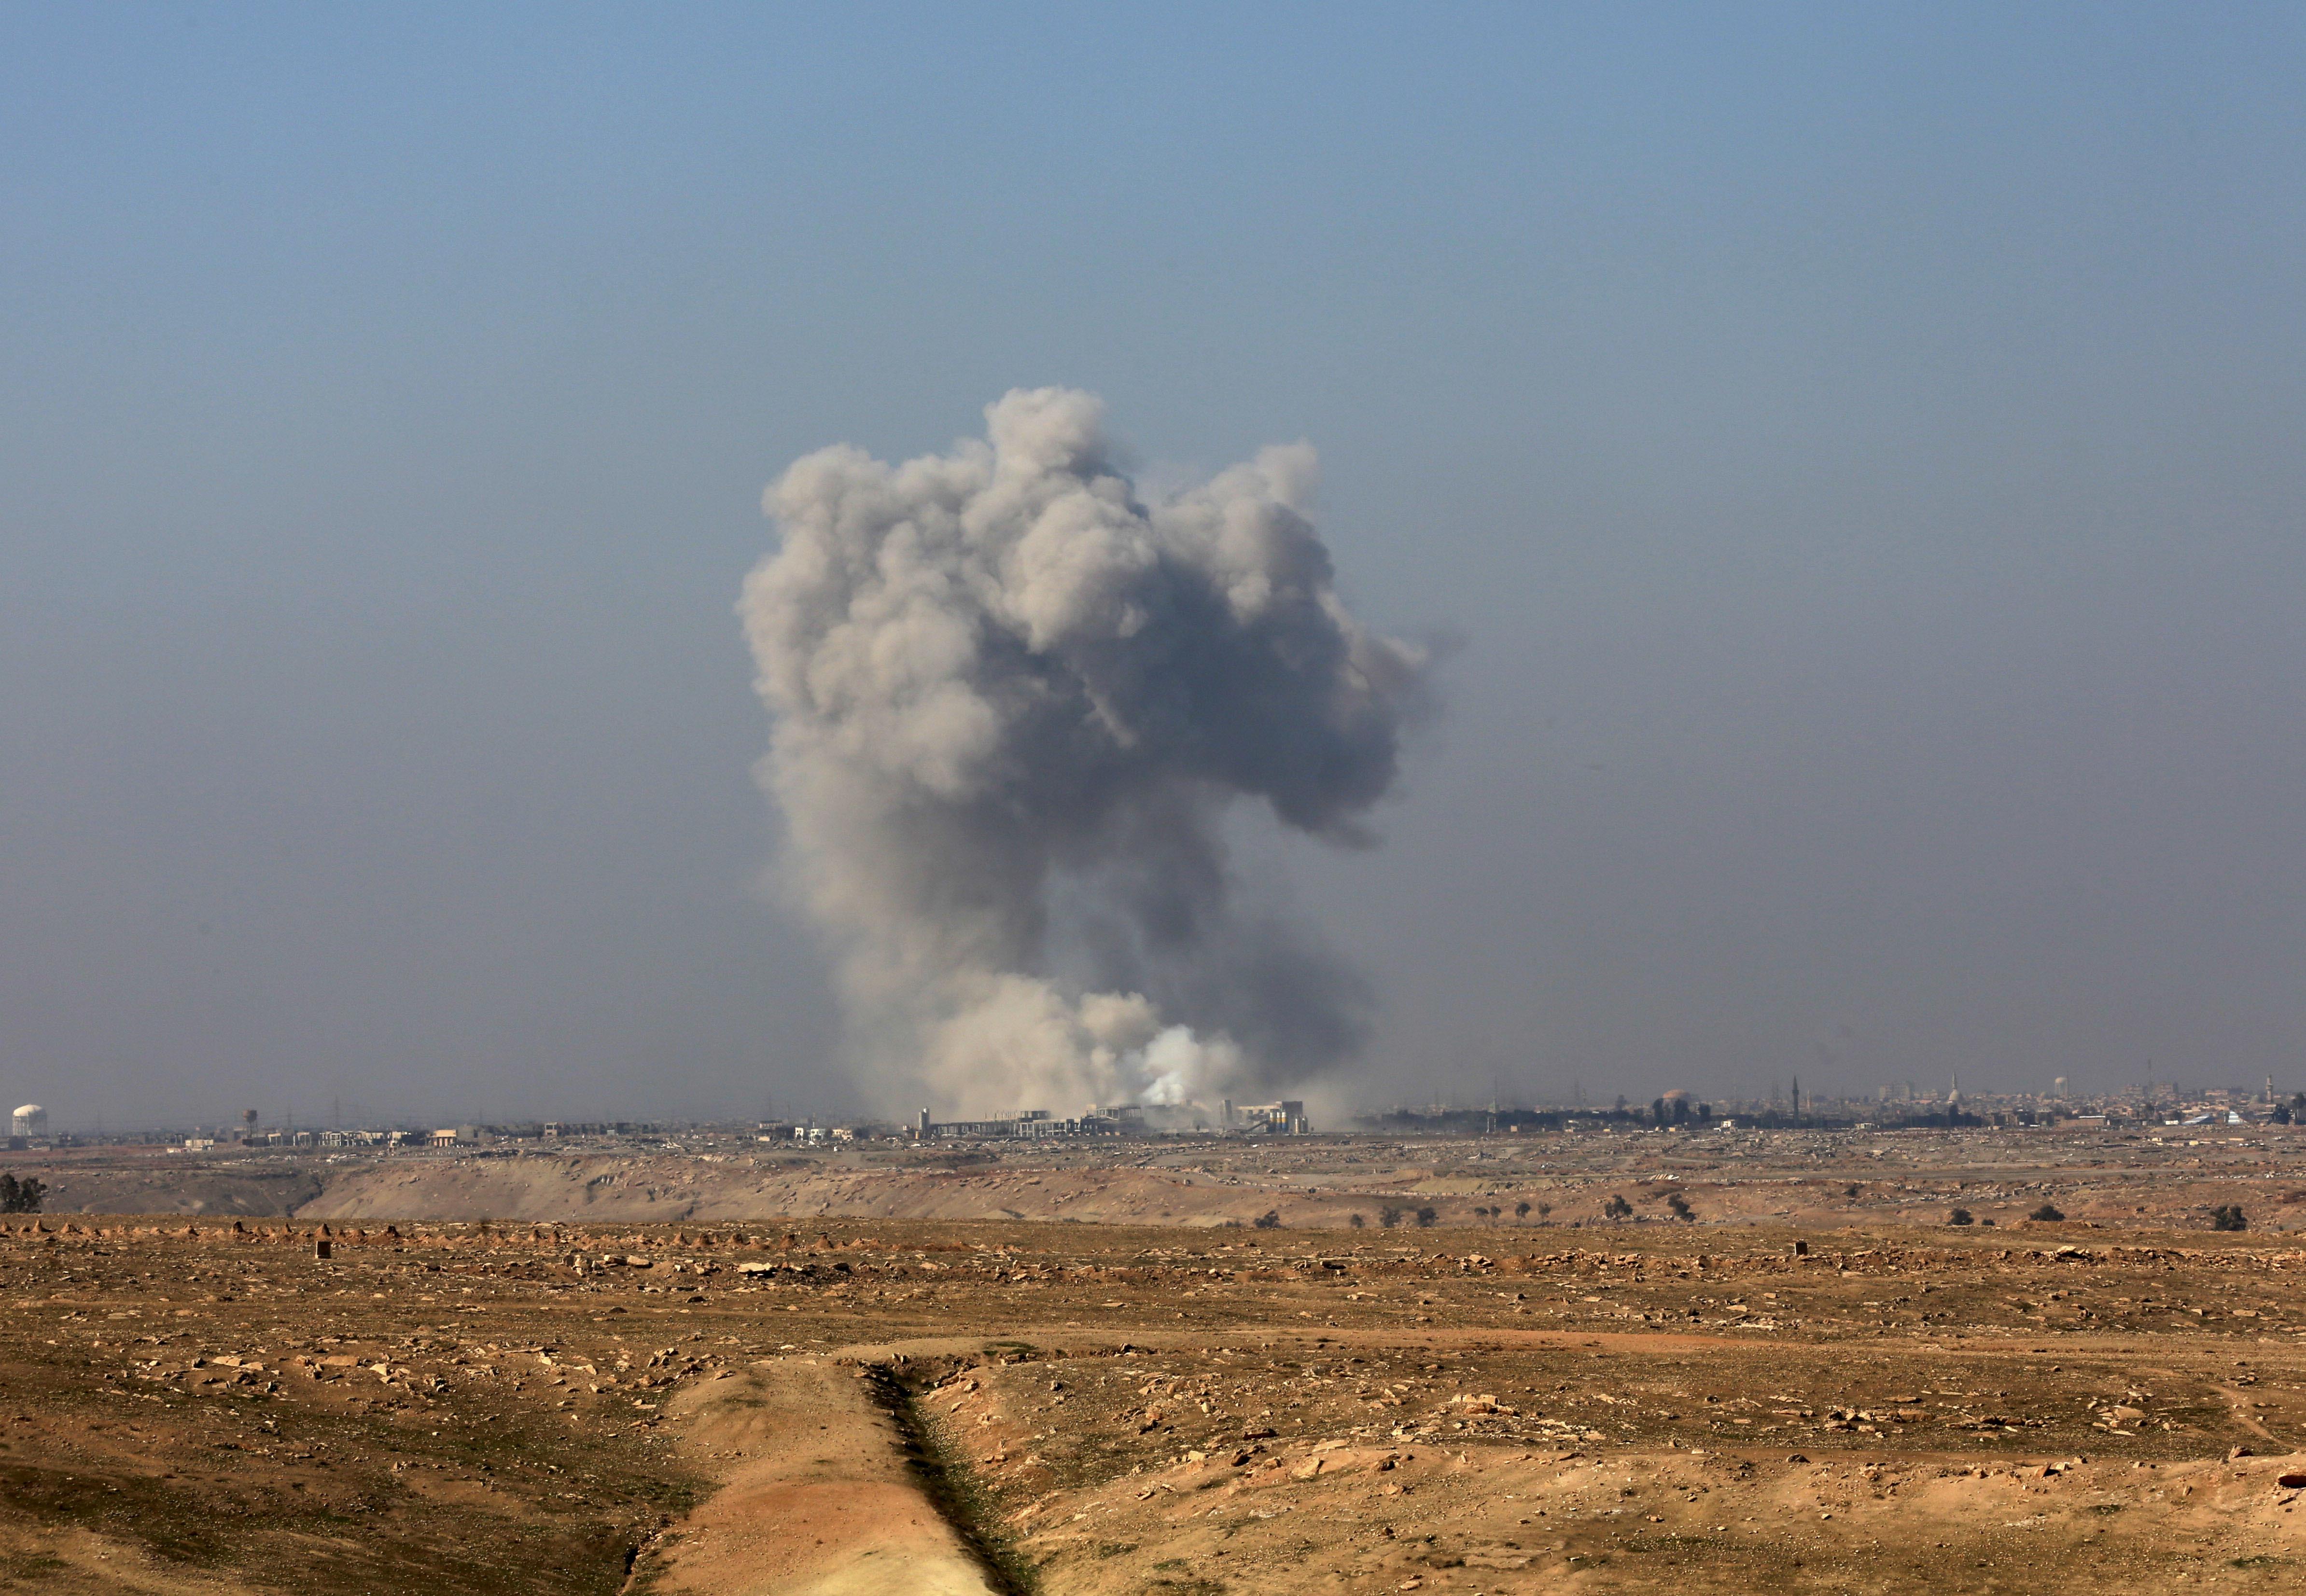 Smoke rises from the western side of Mosul following a U.S.-led coalition airstrike, in Abu Saif, outside the western side of Mosul, Iraq on Feb. 22, 2017. (AP Photo/ Khalid Mohammed)